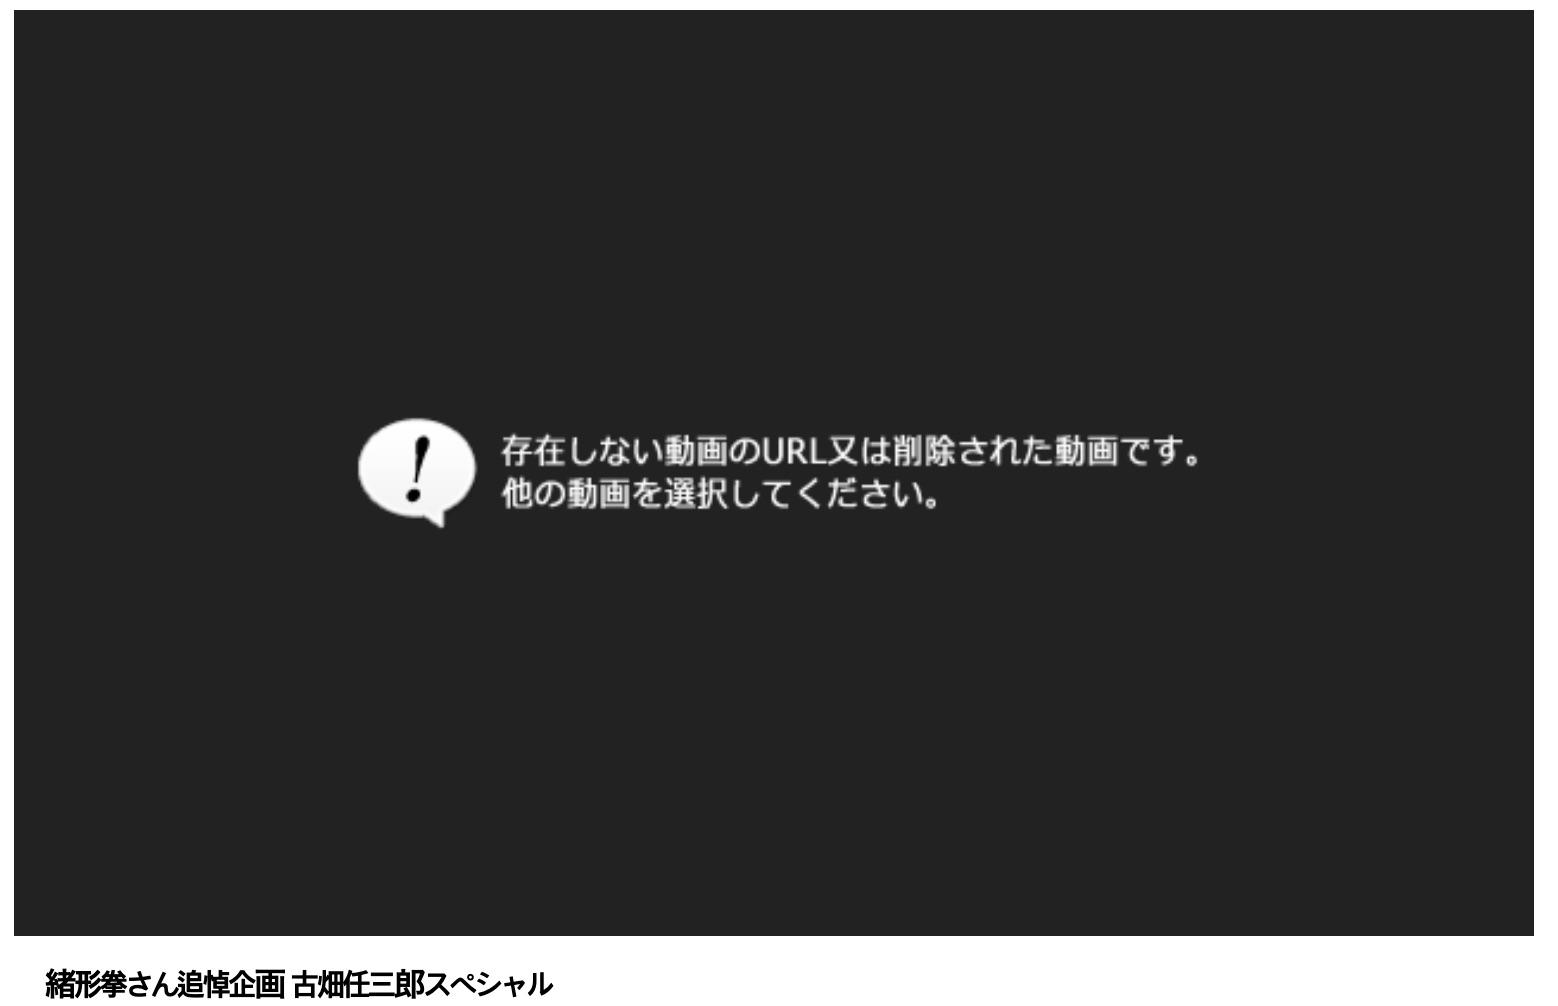 Pandora_TVで削除された古畑任三郎